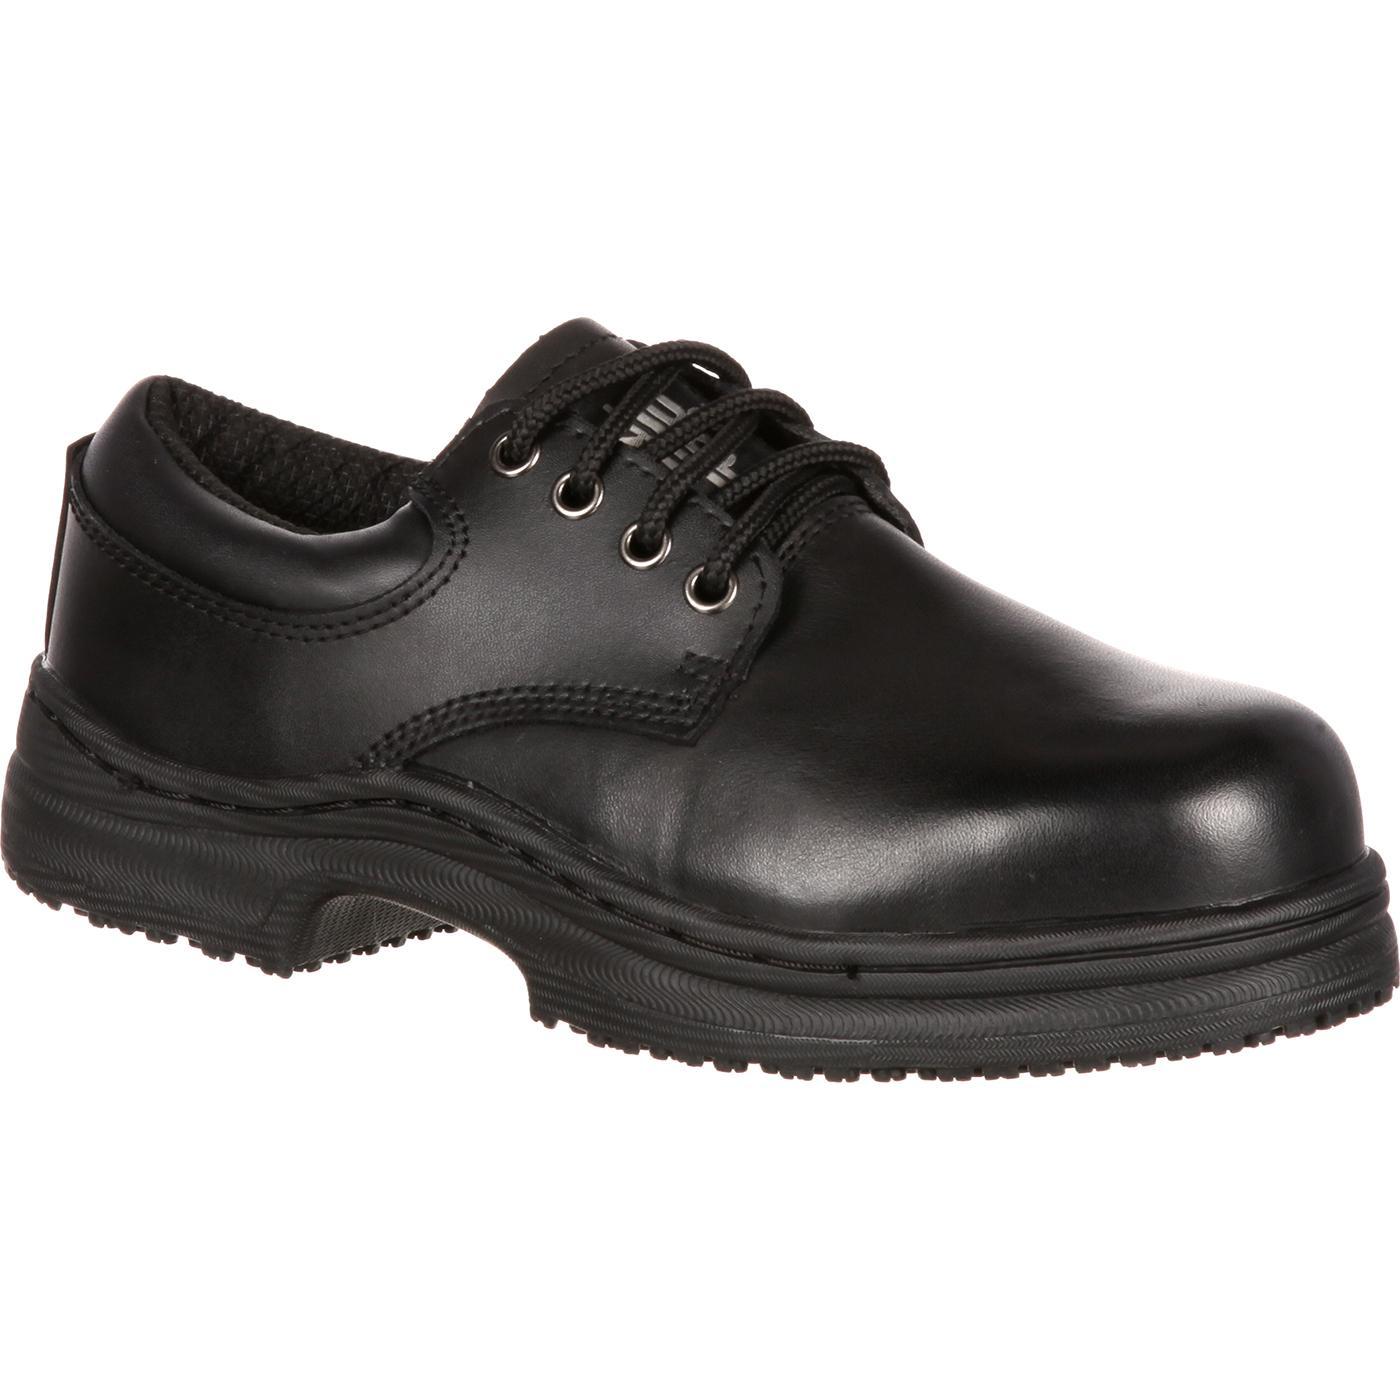 Mens Comfortable Steel Toe Shoes